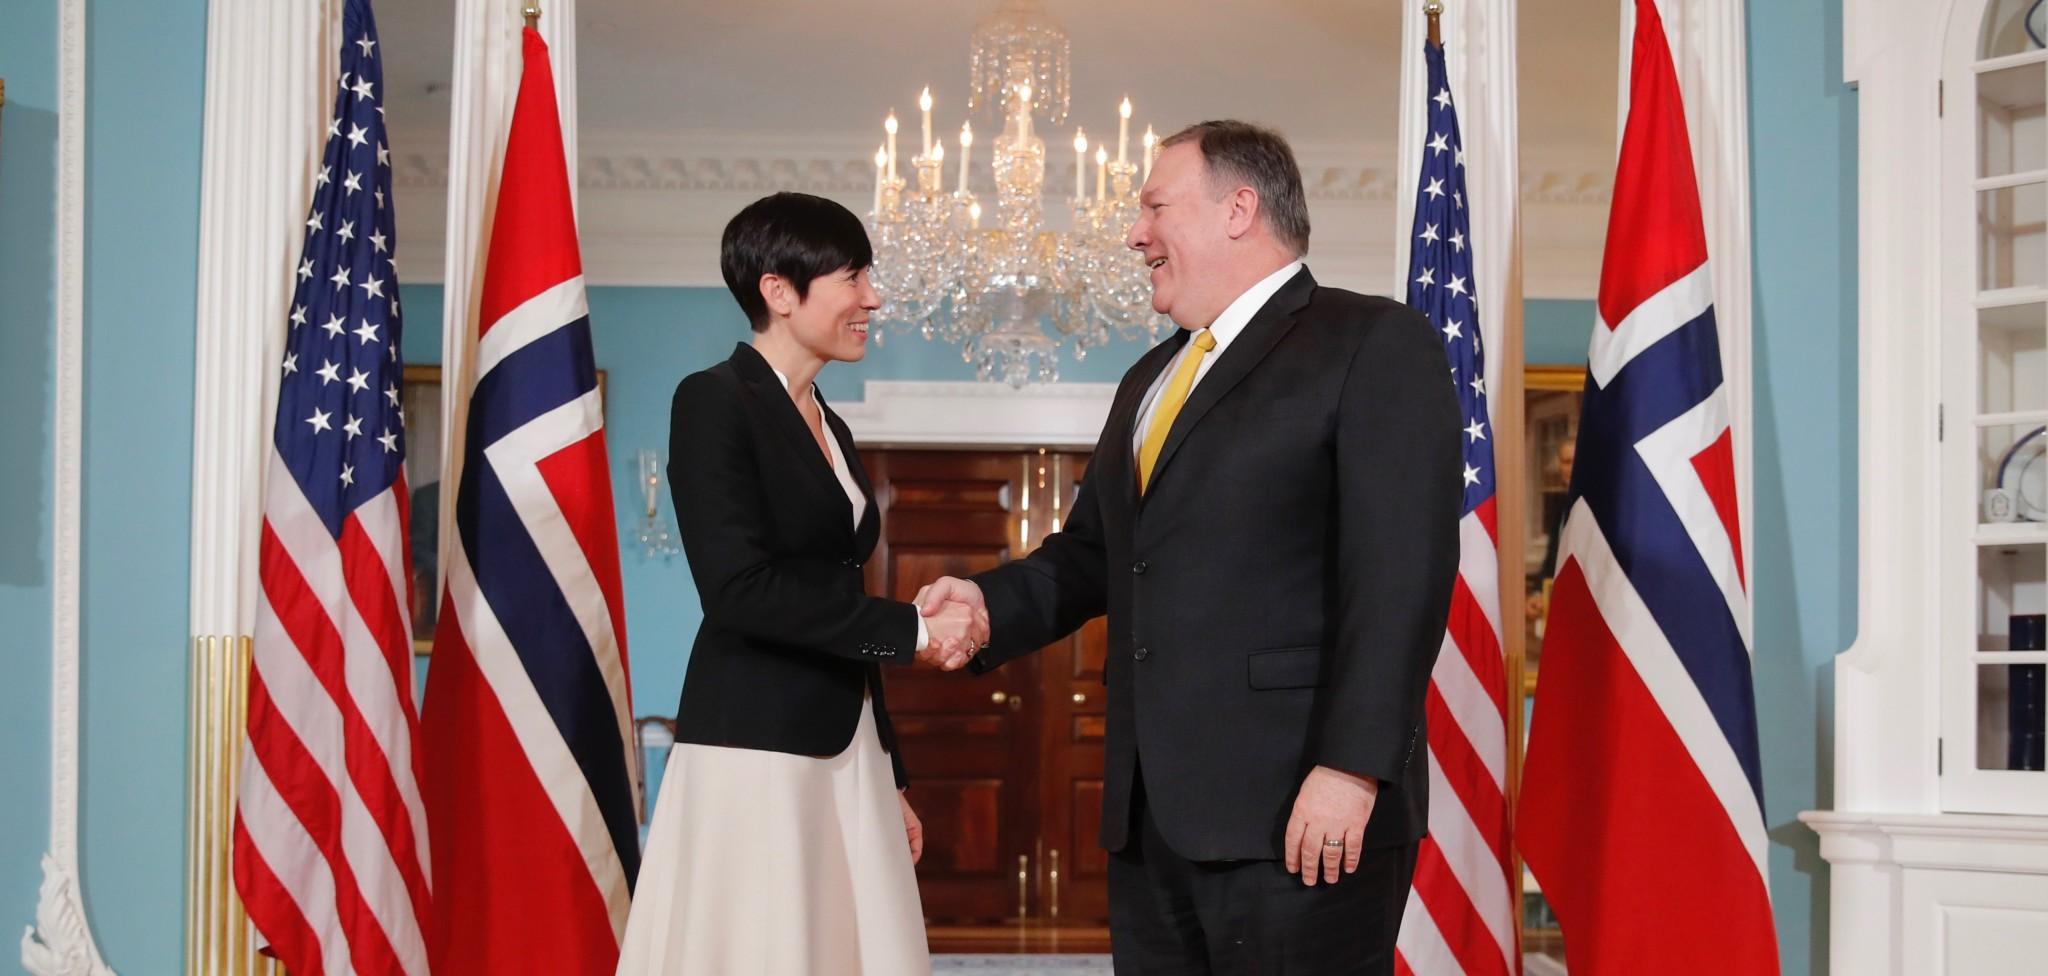 Norge vil ikke hente hjem fremmedkrigere